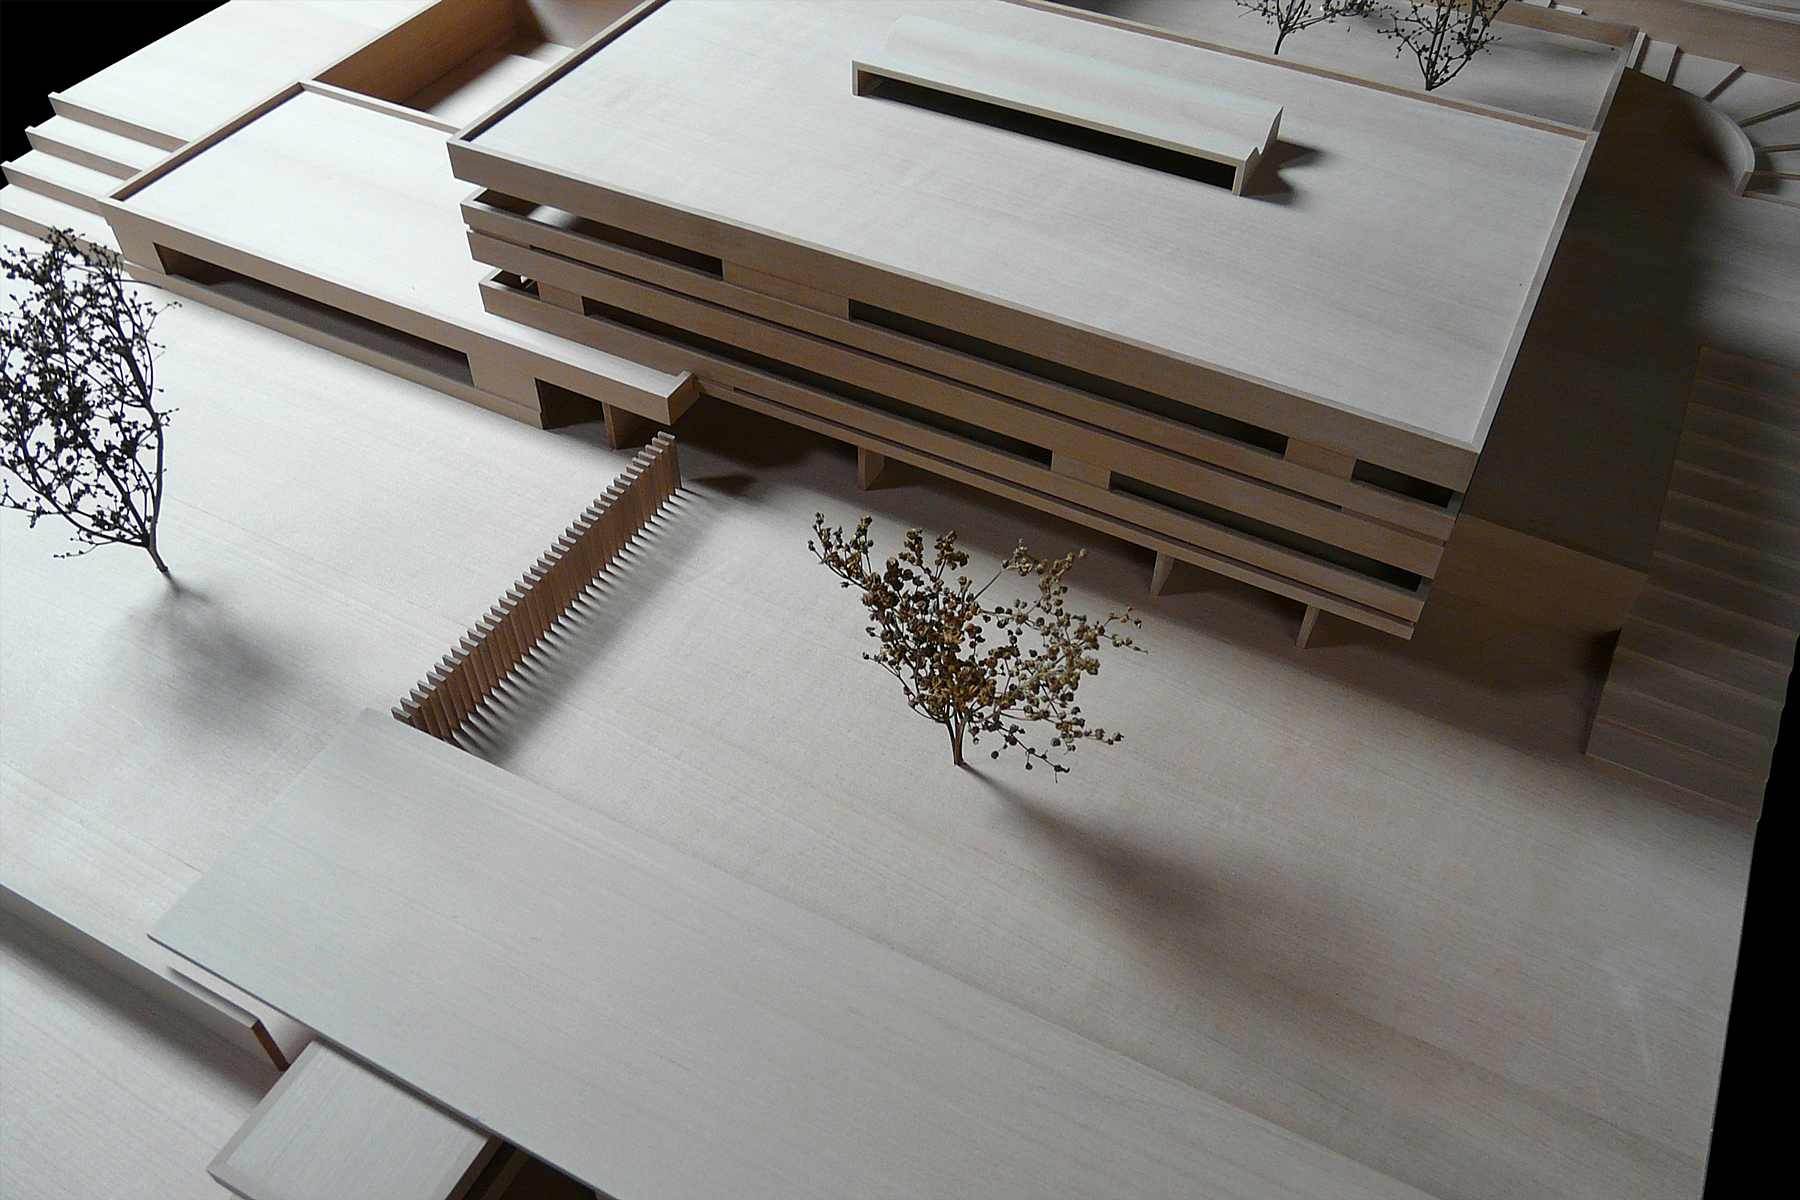 architekturmodell deutsche botschaft tiflis b la berec modellbau 1 100. Black Bedroom Furniture Sets. Home Design Ideas